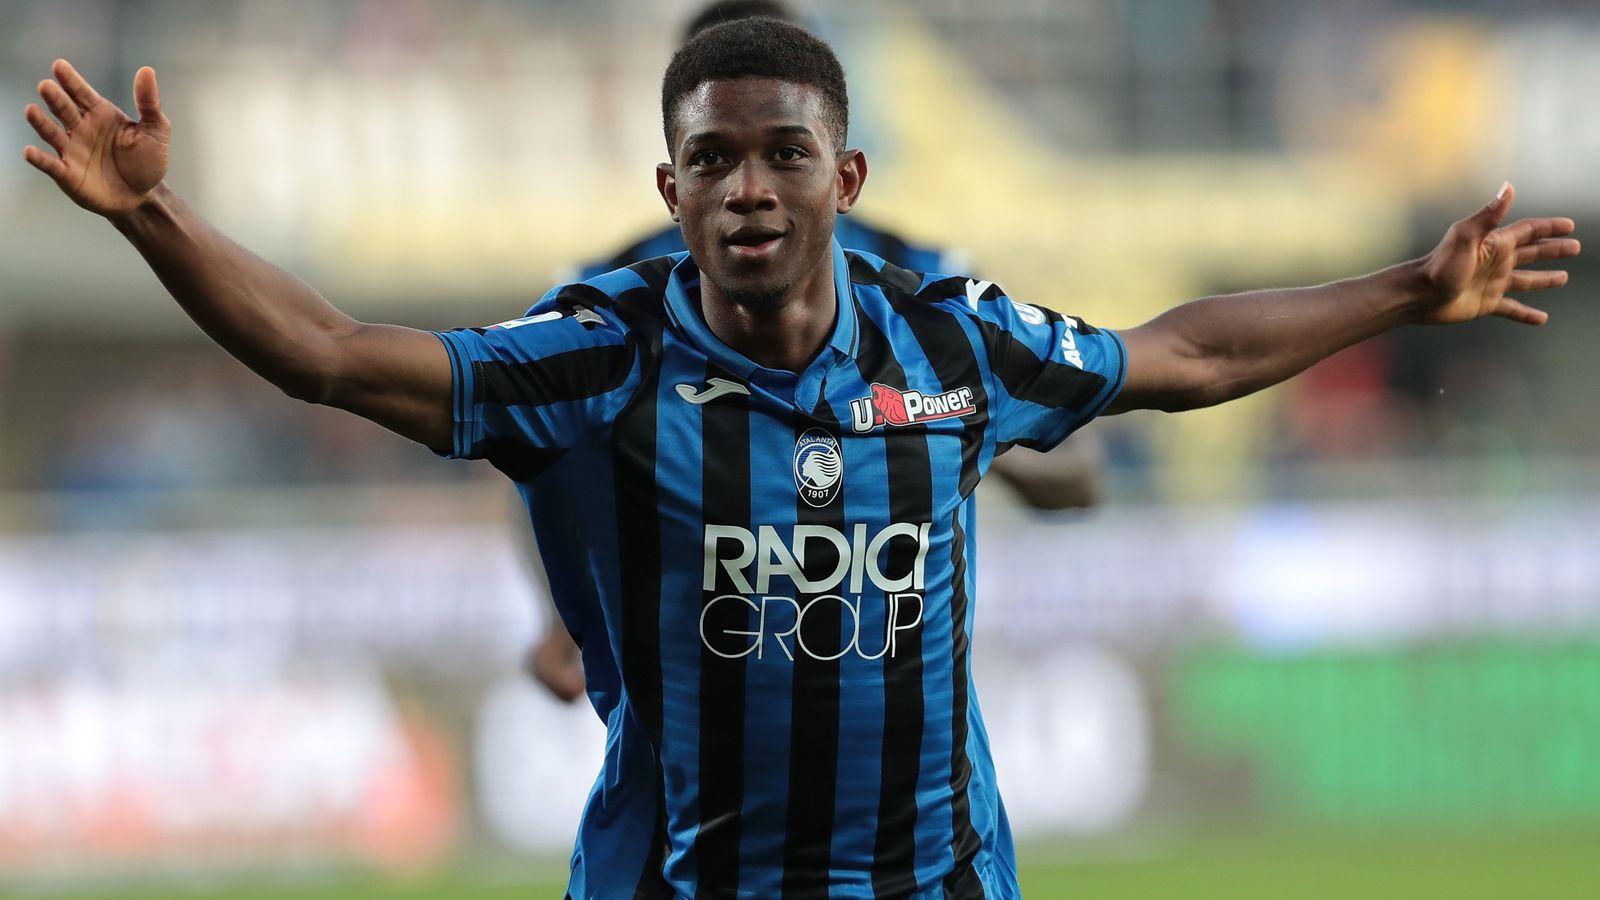 Football,Amad Diallo